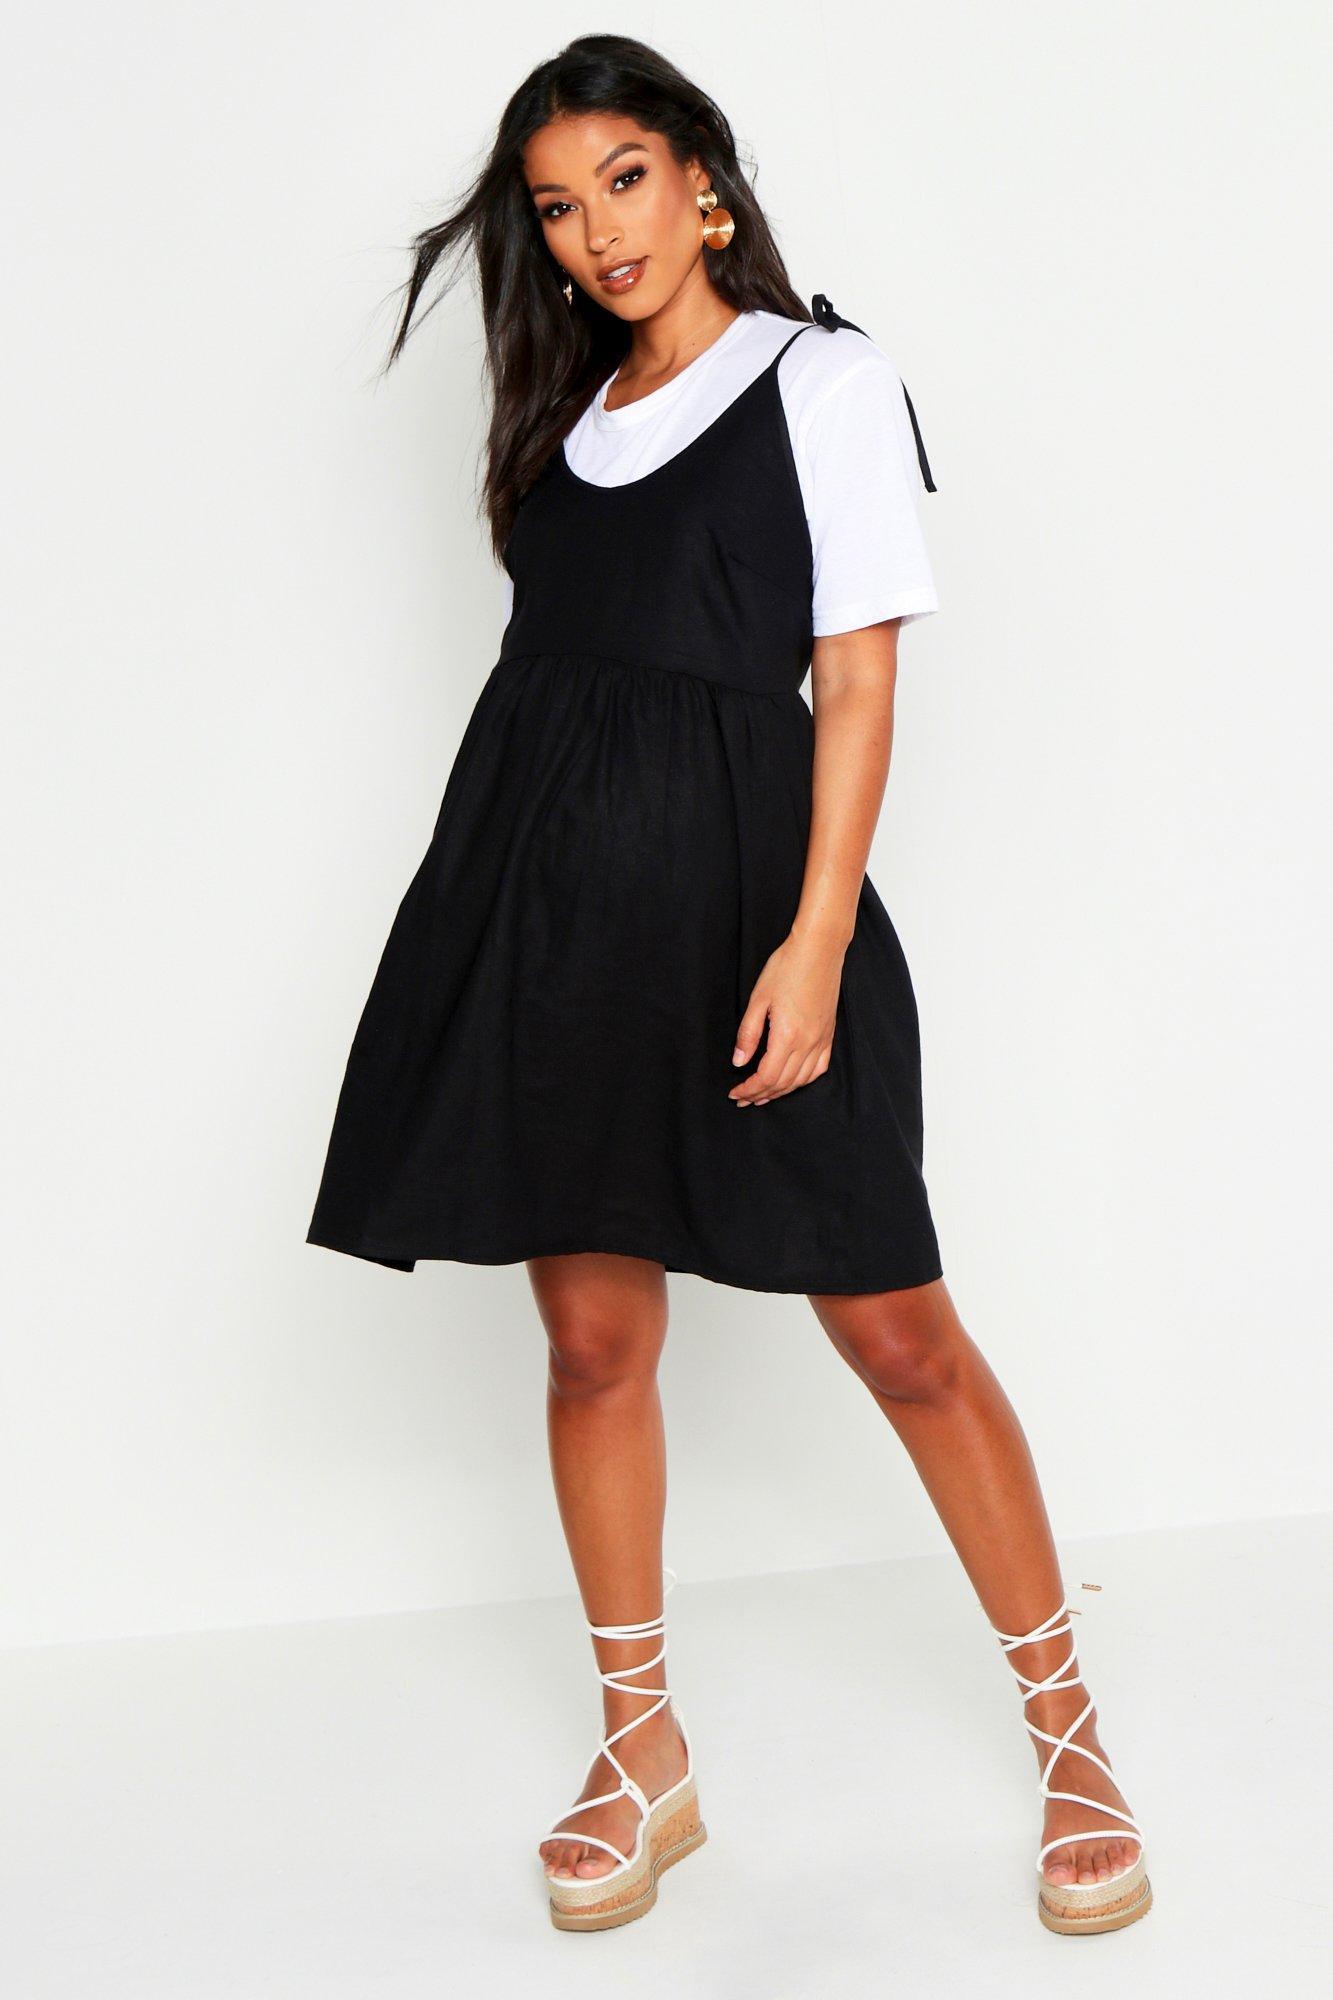 e0d06b78837 Boohoo. Women's Maternity Linen Tie Shoulder Smock Dress